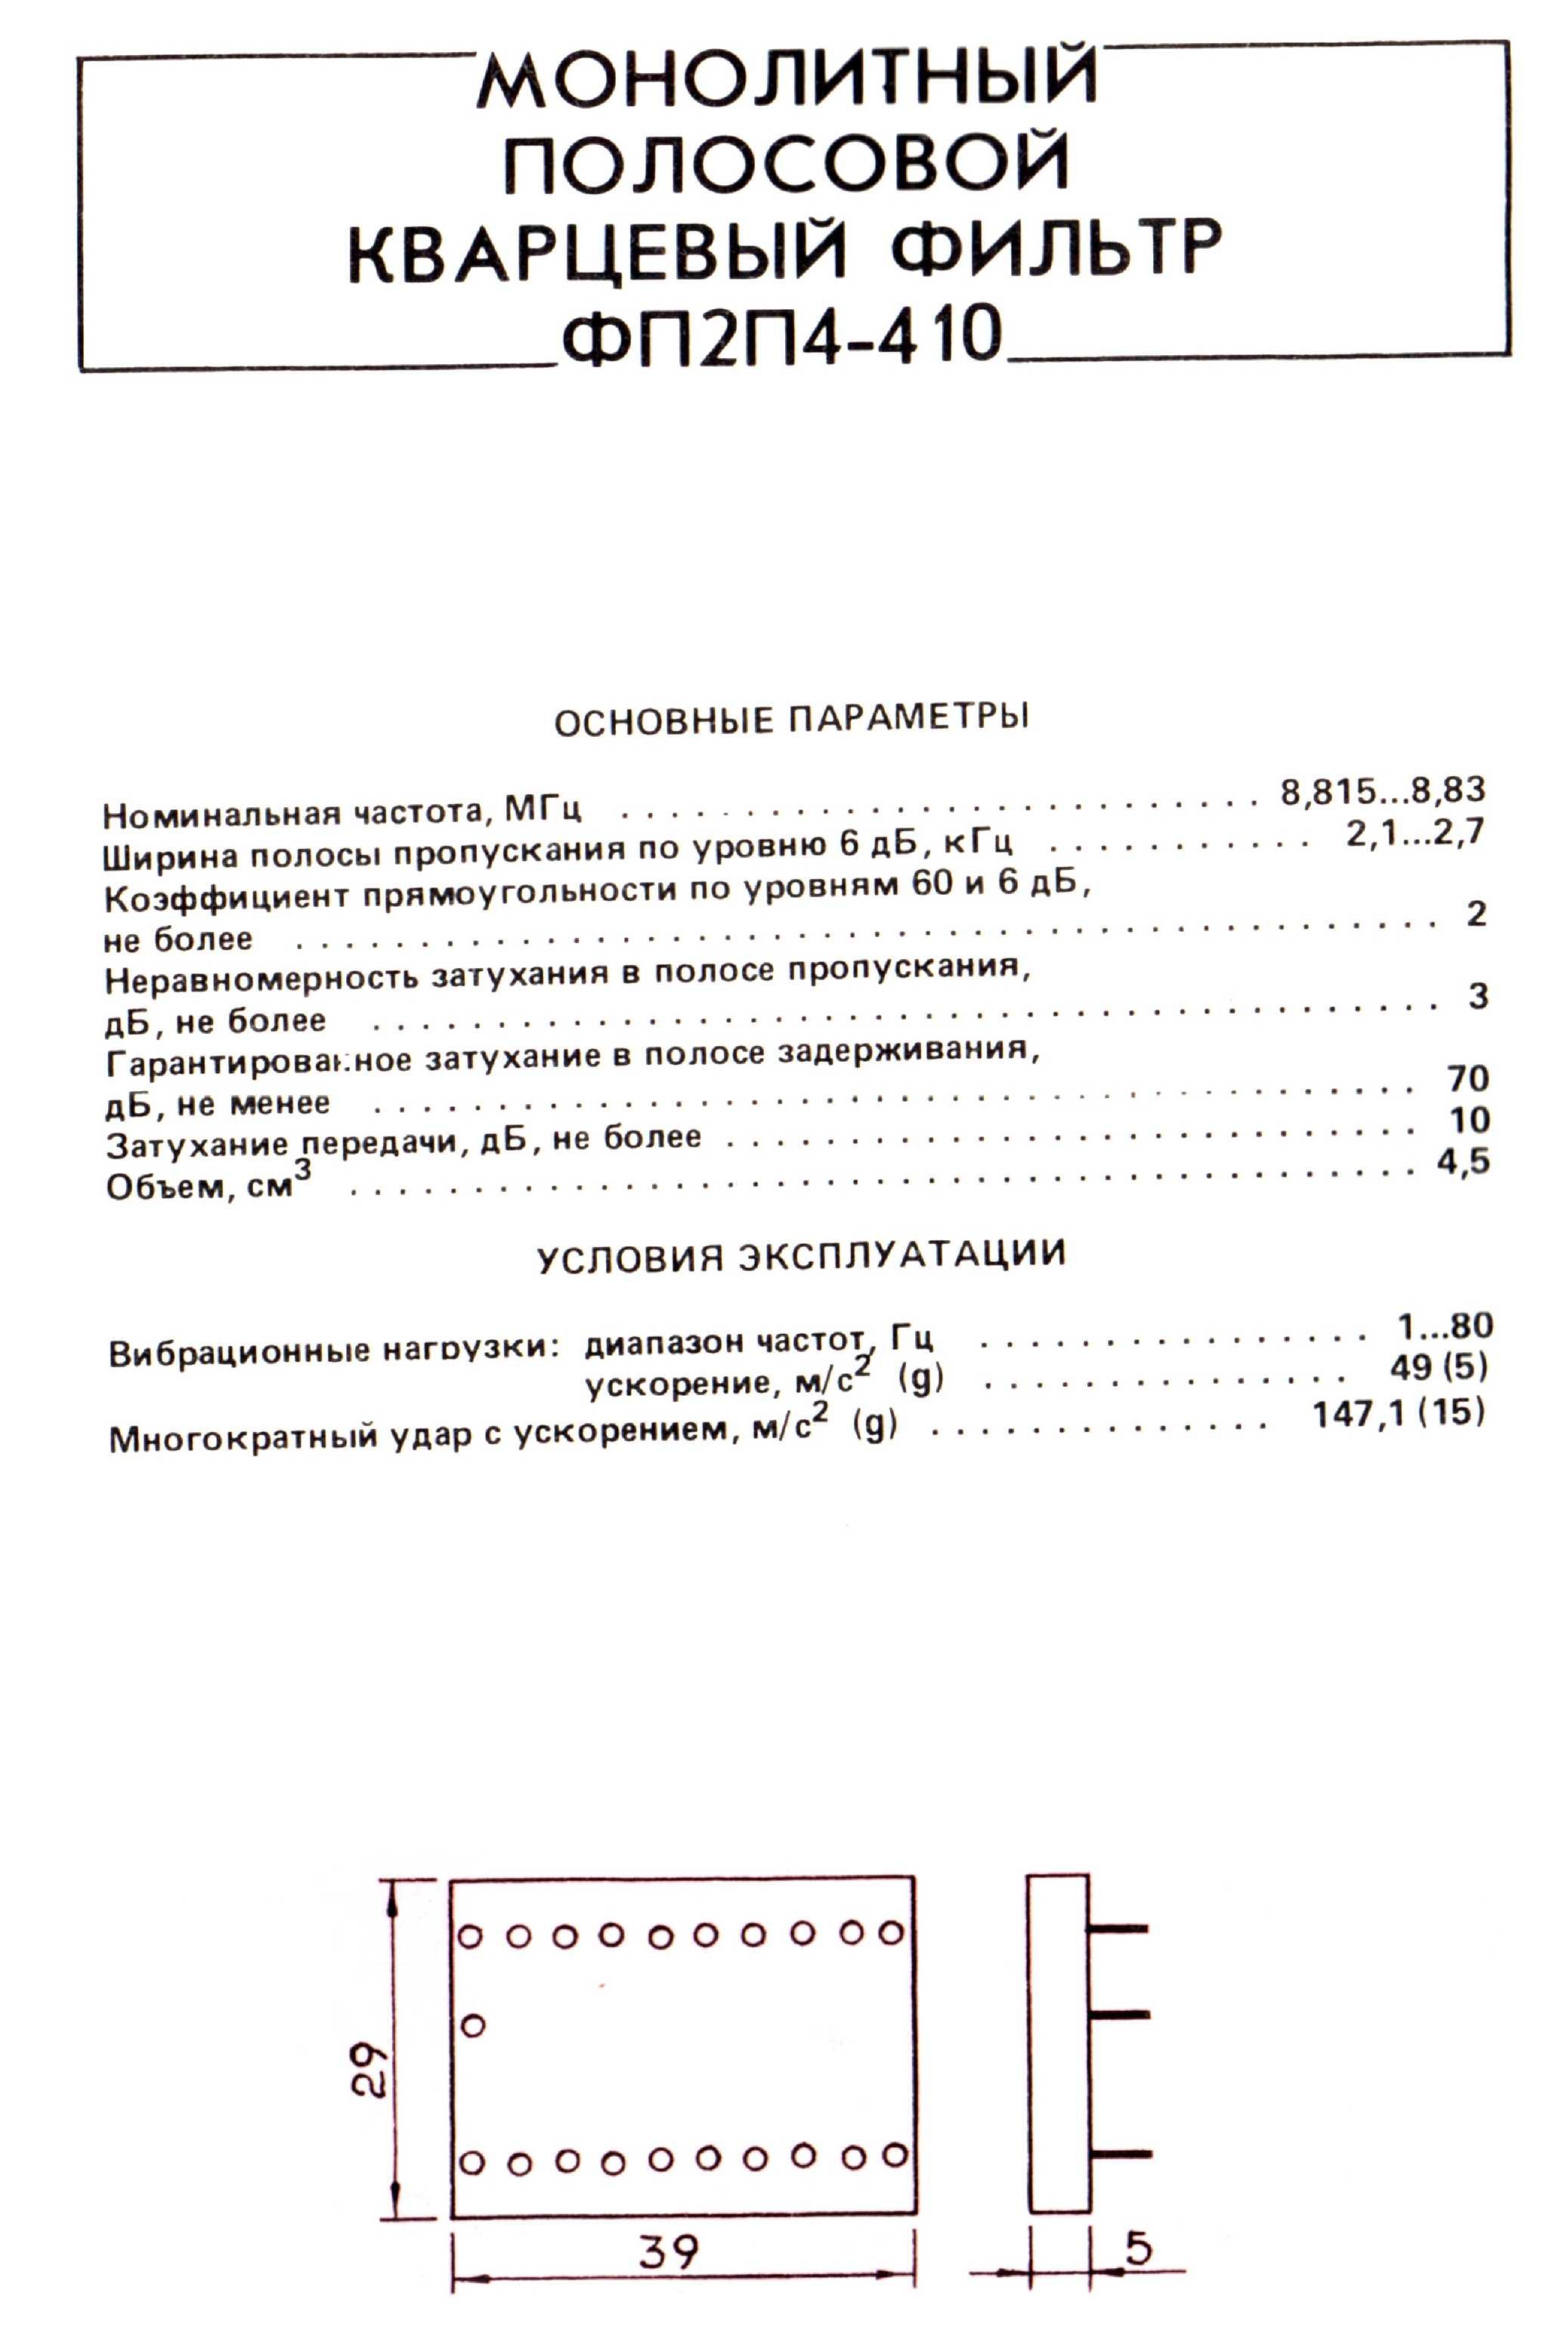 Кварц, Москва | Магазин радиодеталей, Буженинова, 16